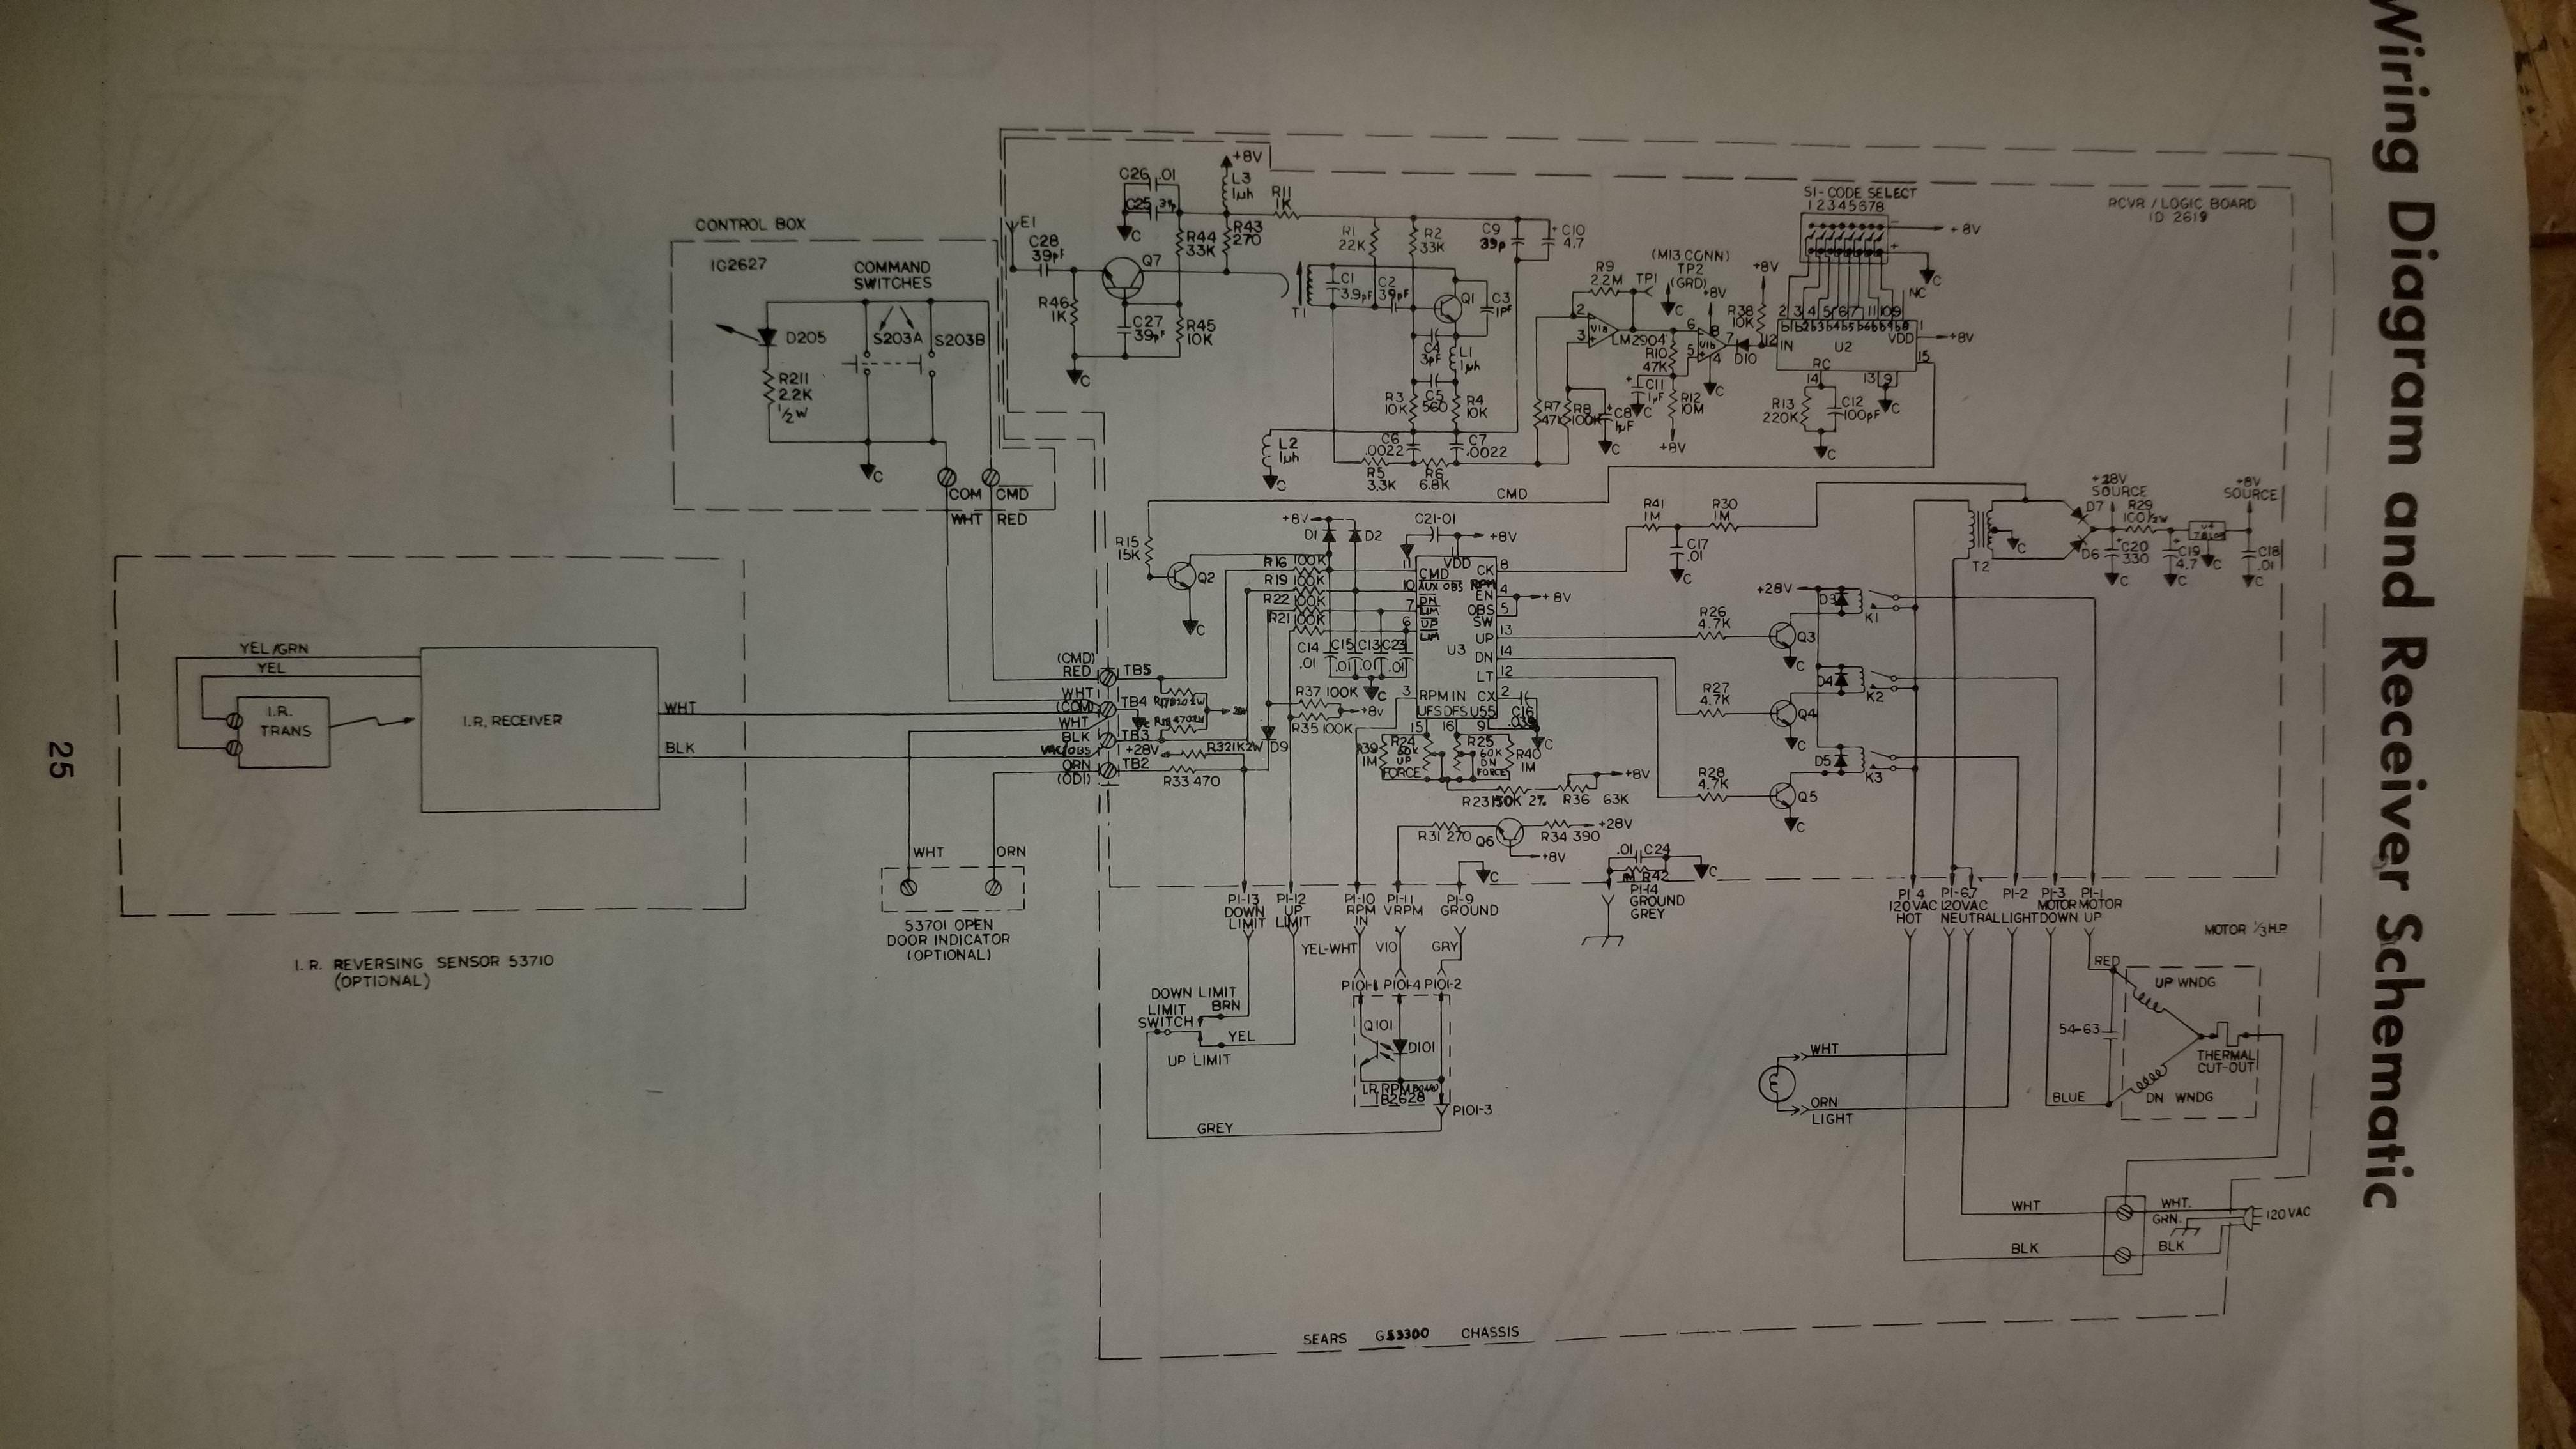 My old Sears / Craftsman garage door opener manual includes wiring ...